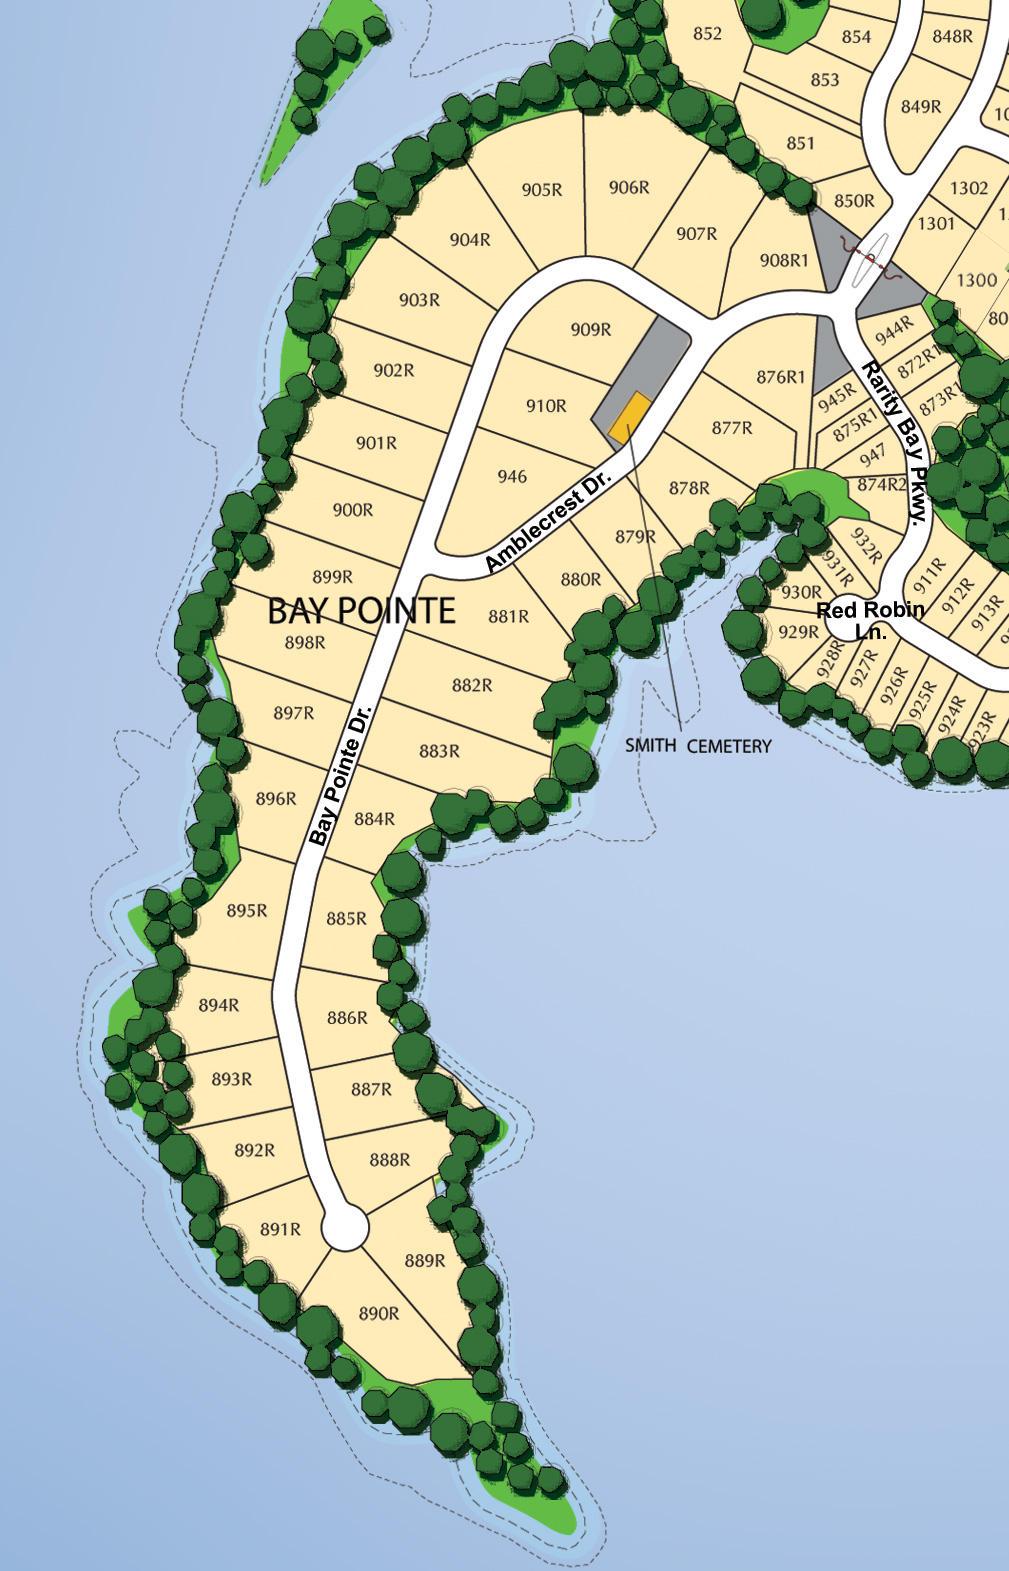 L-882r Bay Pointe Drive: